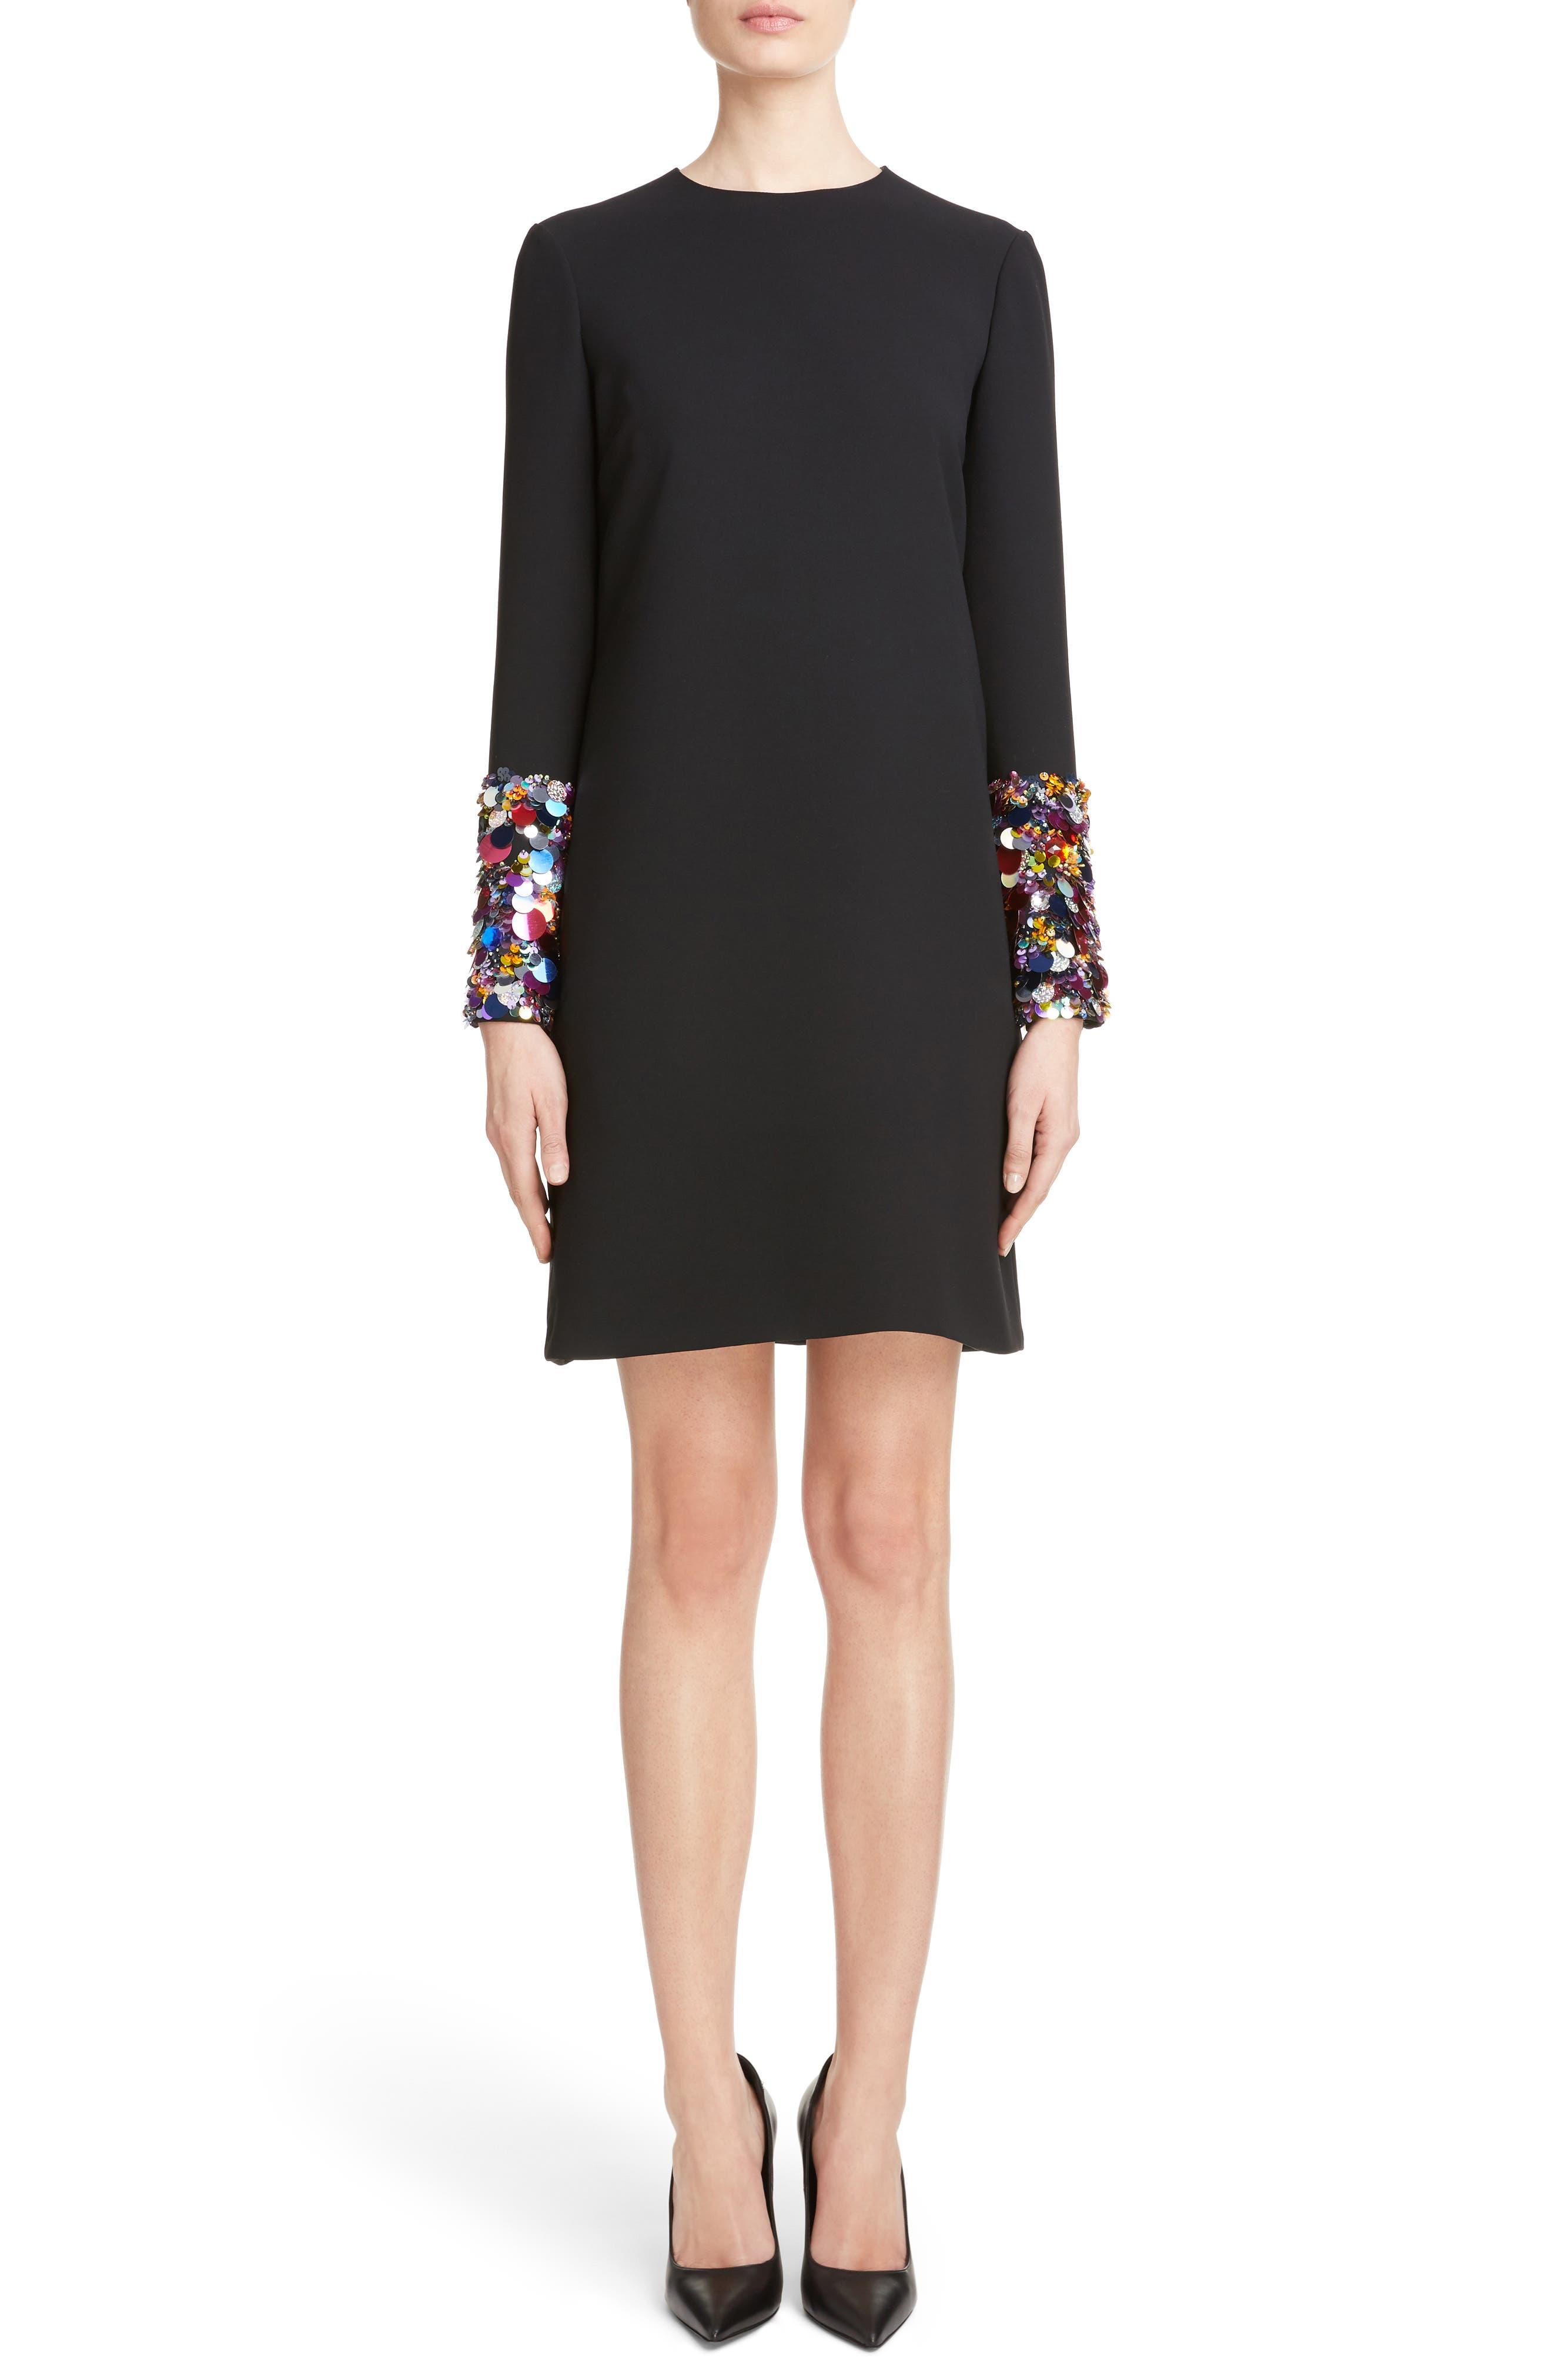 Alternate Image 1 Selected - Victoria, Victoria Beckham Embellished Cuff Shift Dress